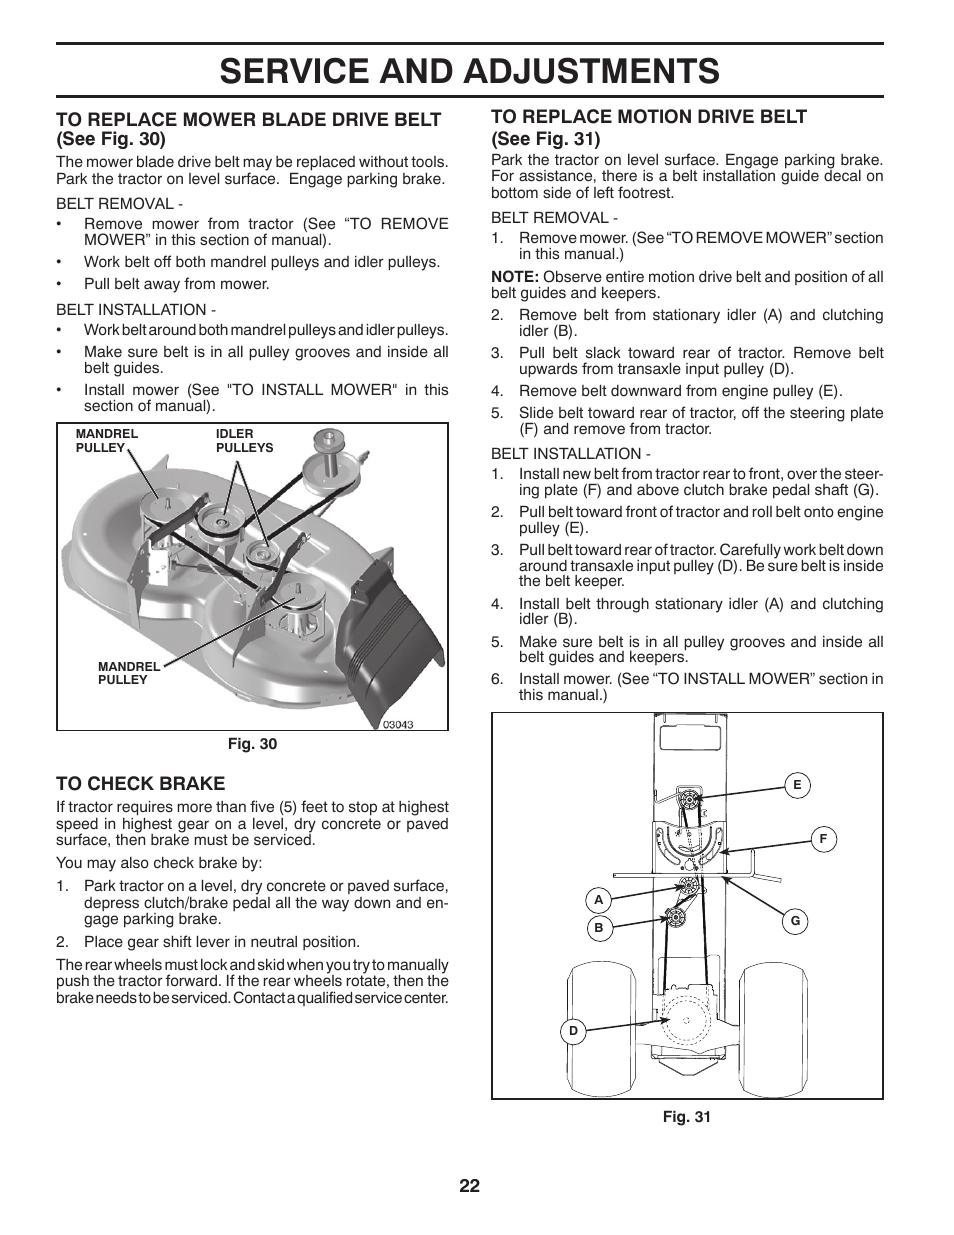 Poulan Pro 42 Inch Riding Mower Drive Belt Diagram : poulan, riding, mower, drive, diagram, Service, Adjustments, Poulan, PB175G42, TRACTOR, Manual